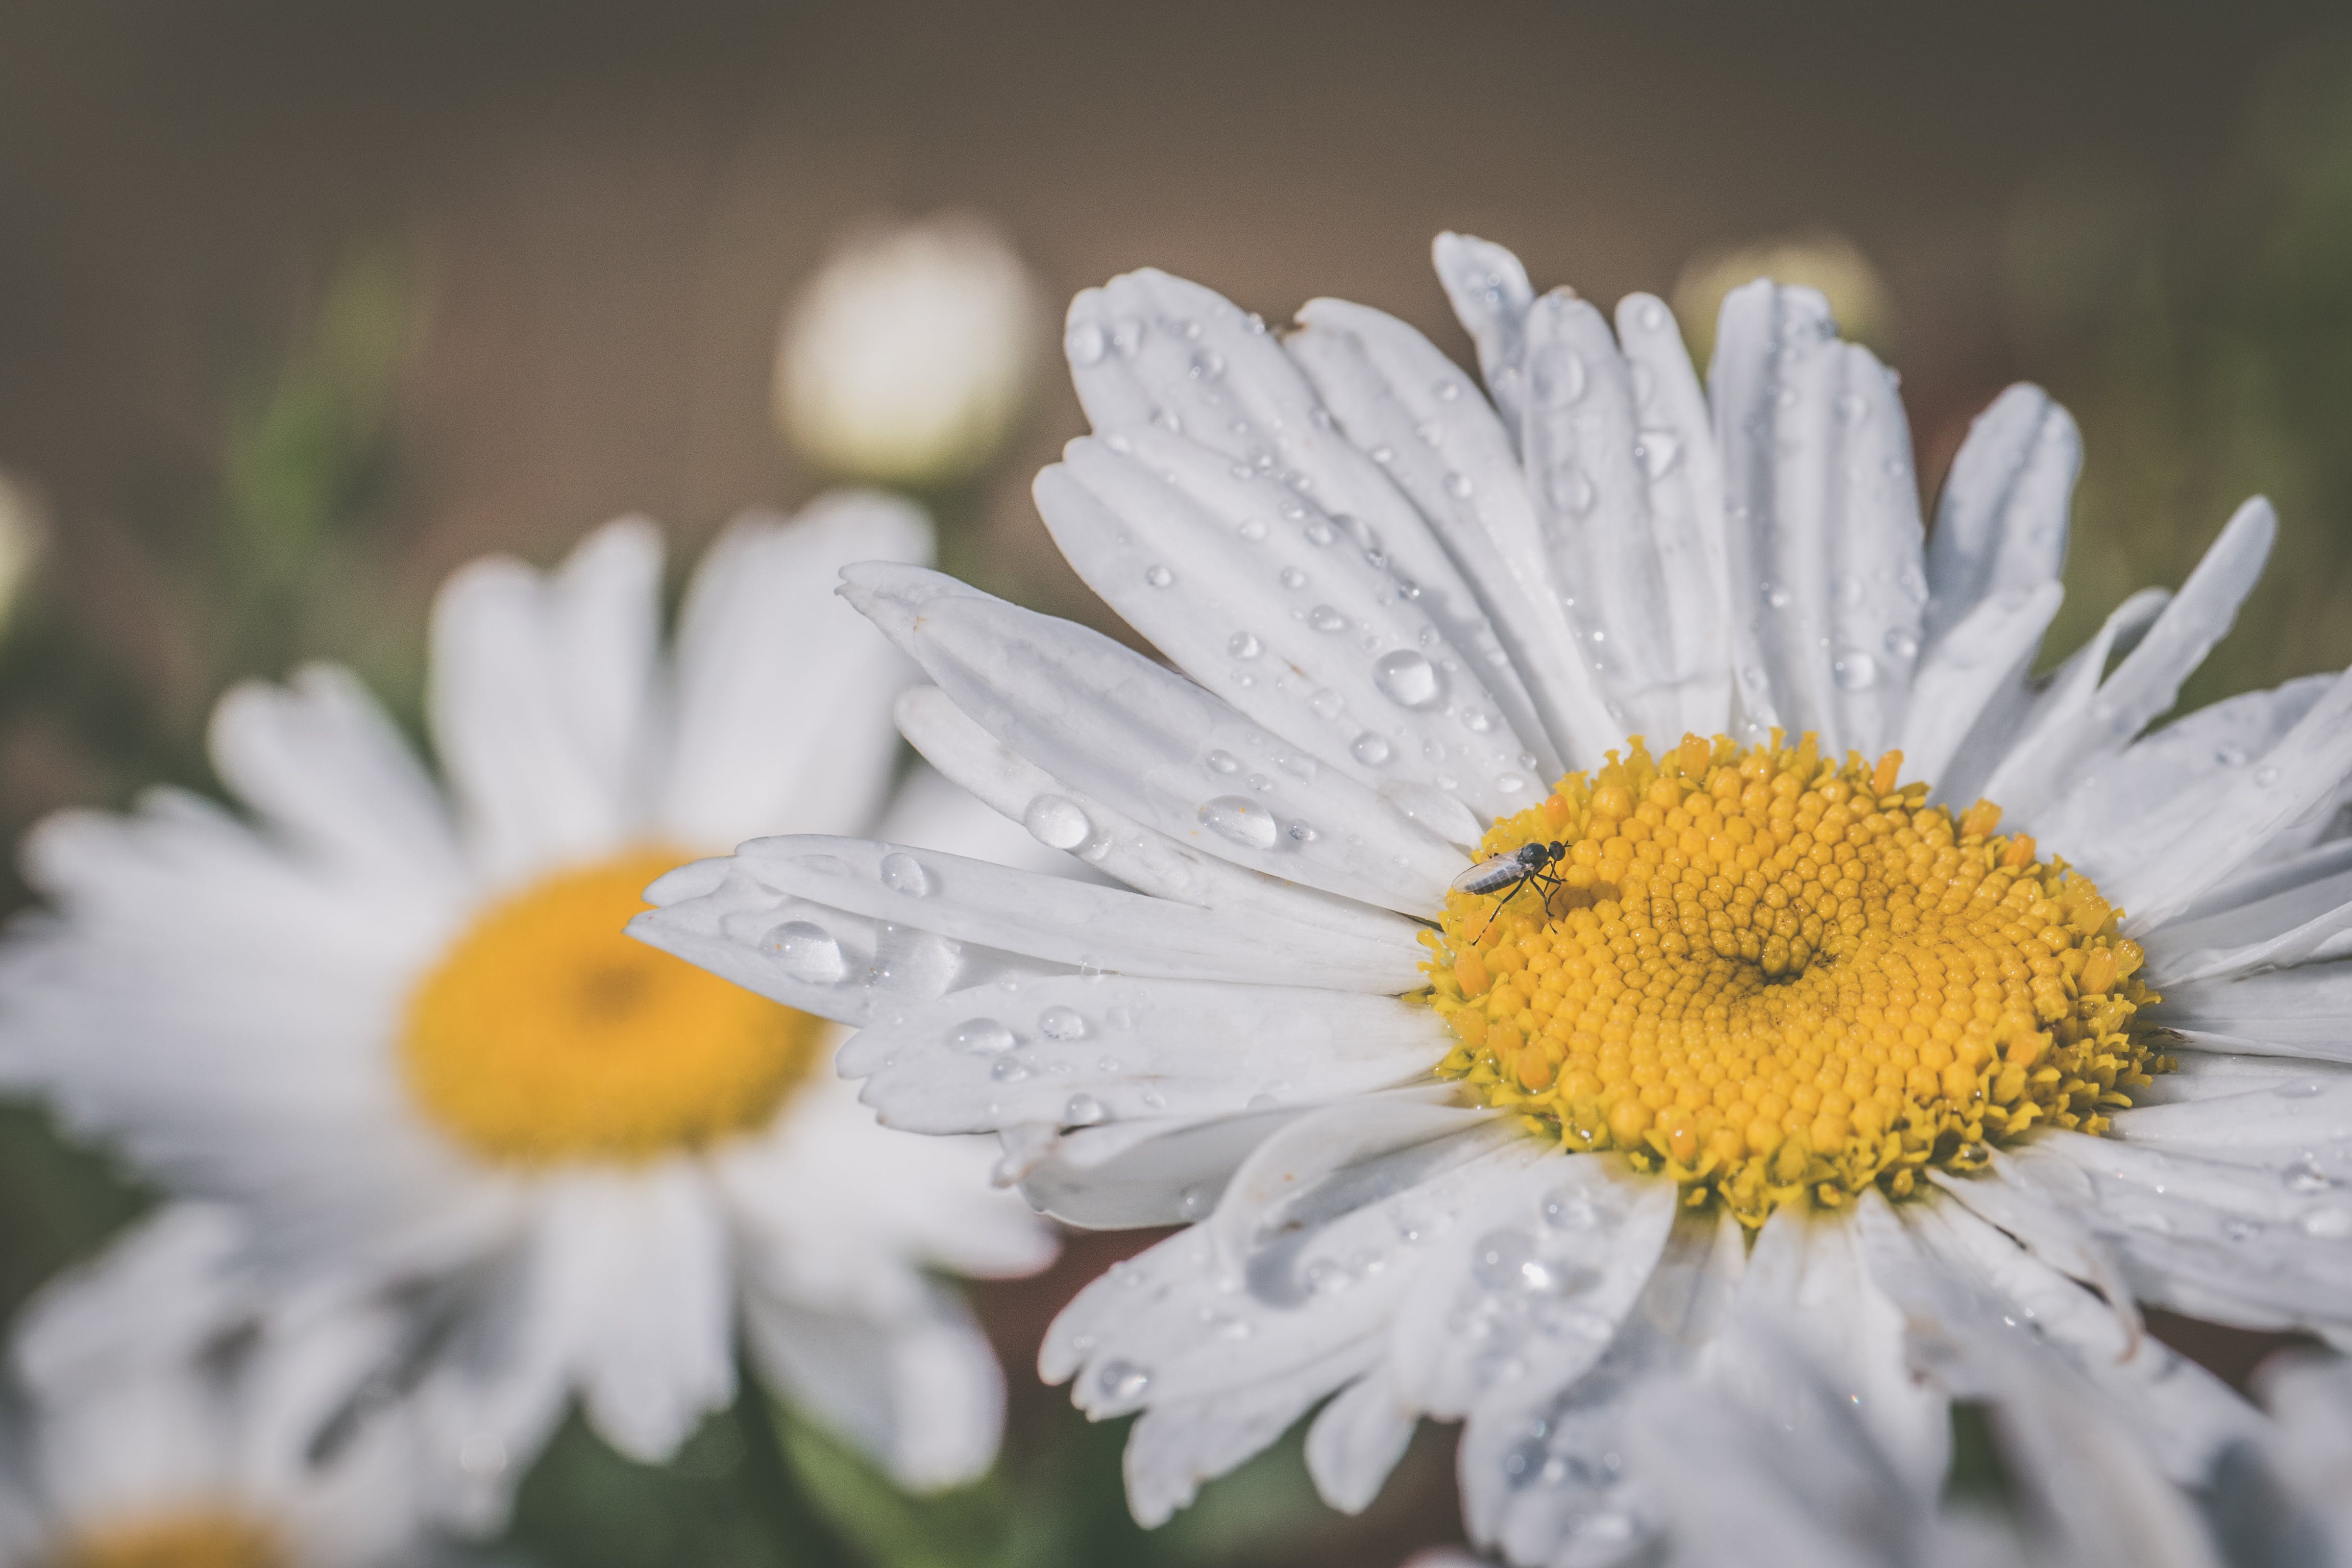 Macro Photography Of White Daisy Flowers